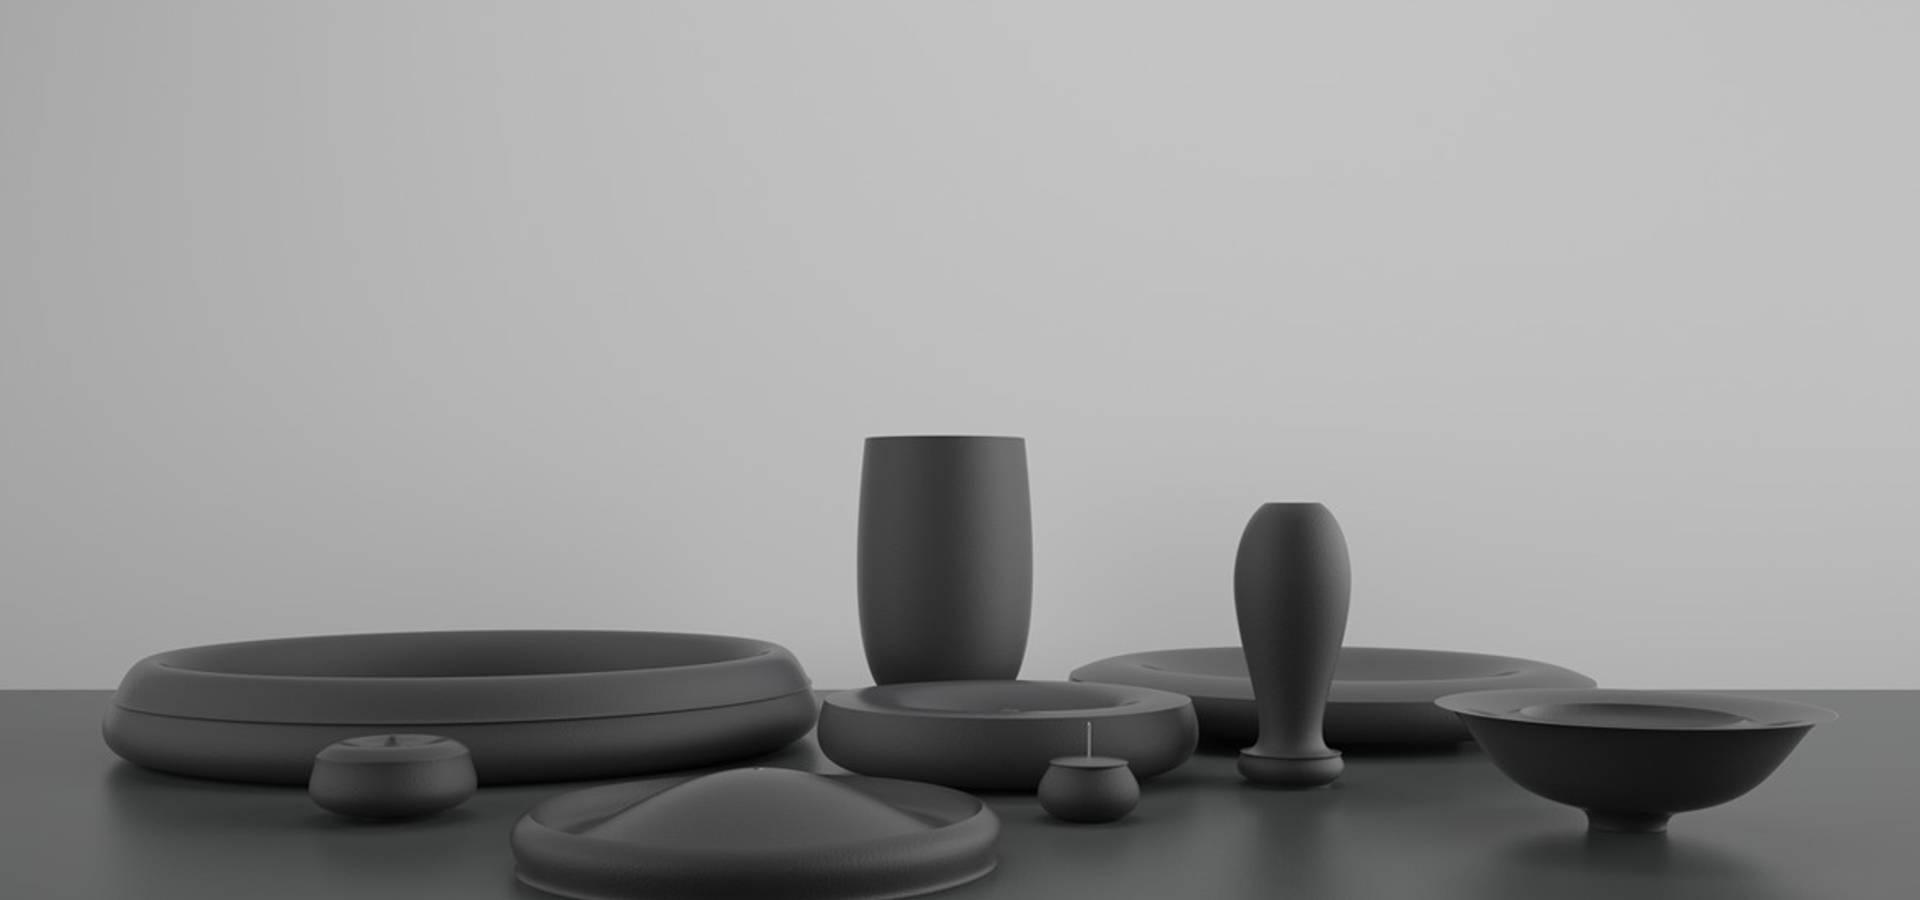 Hozan Zangana studio